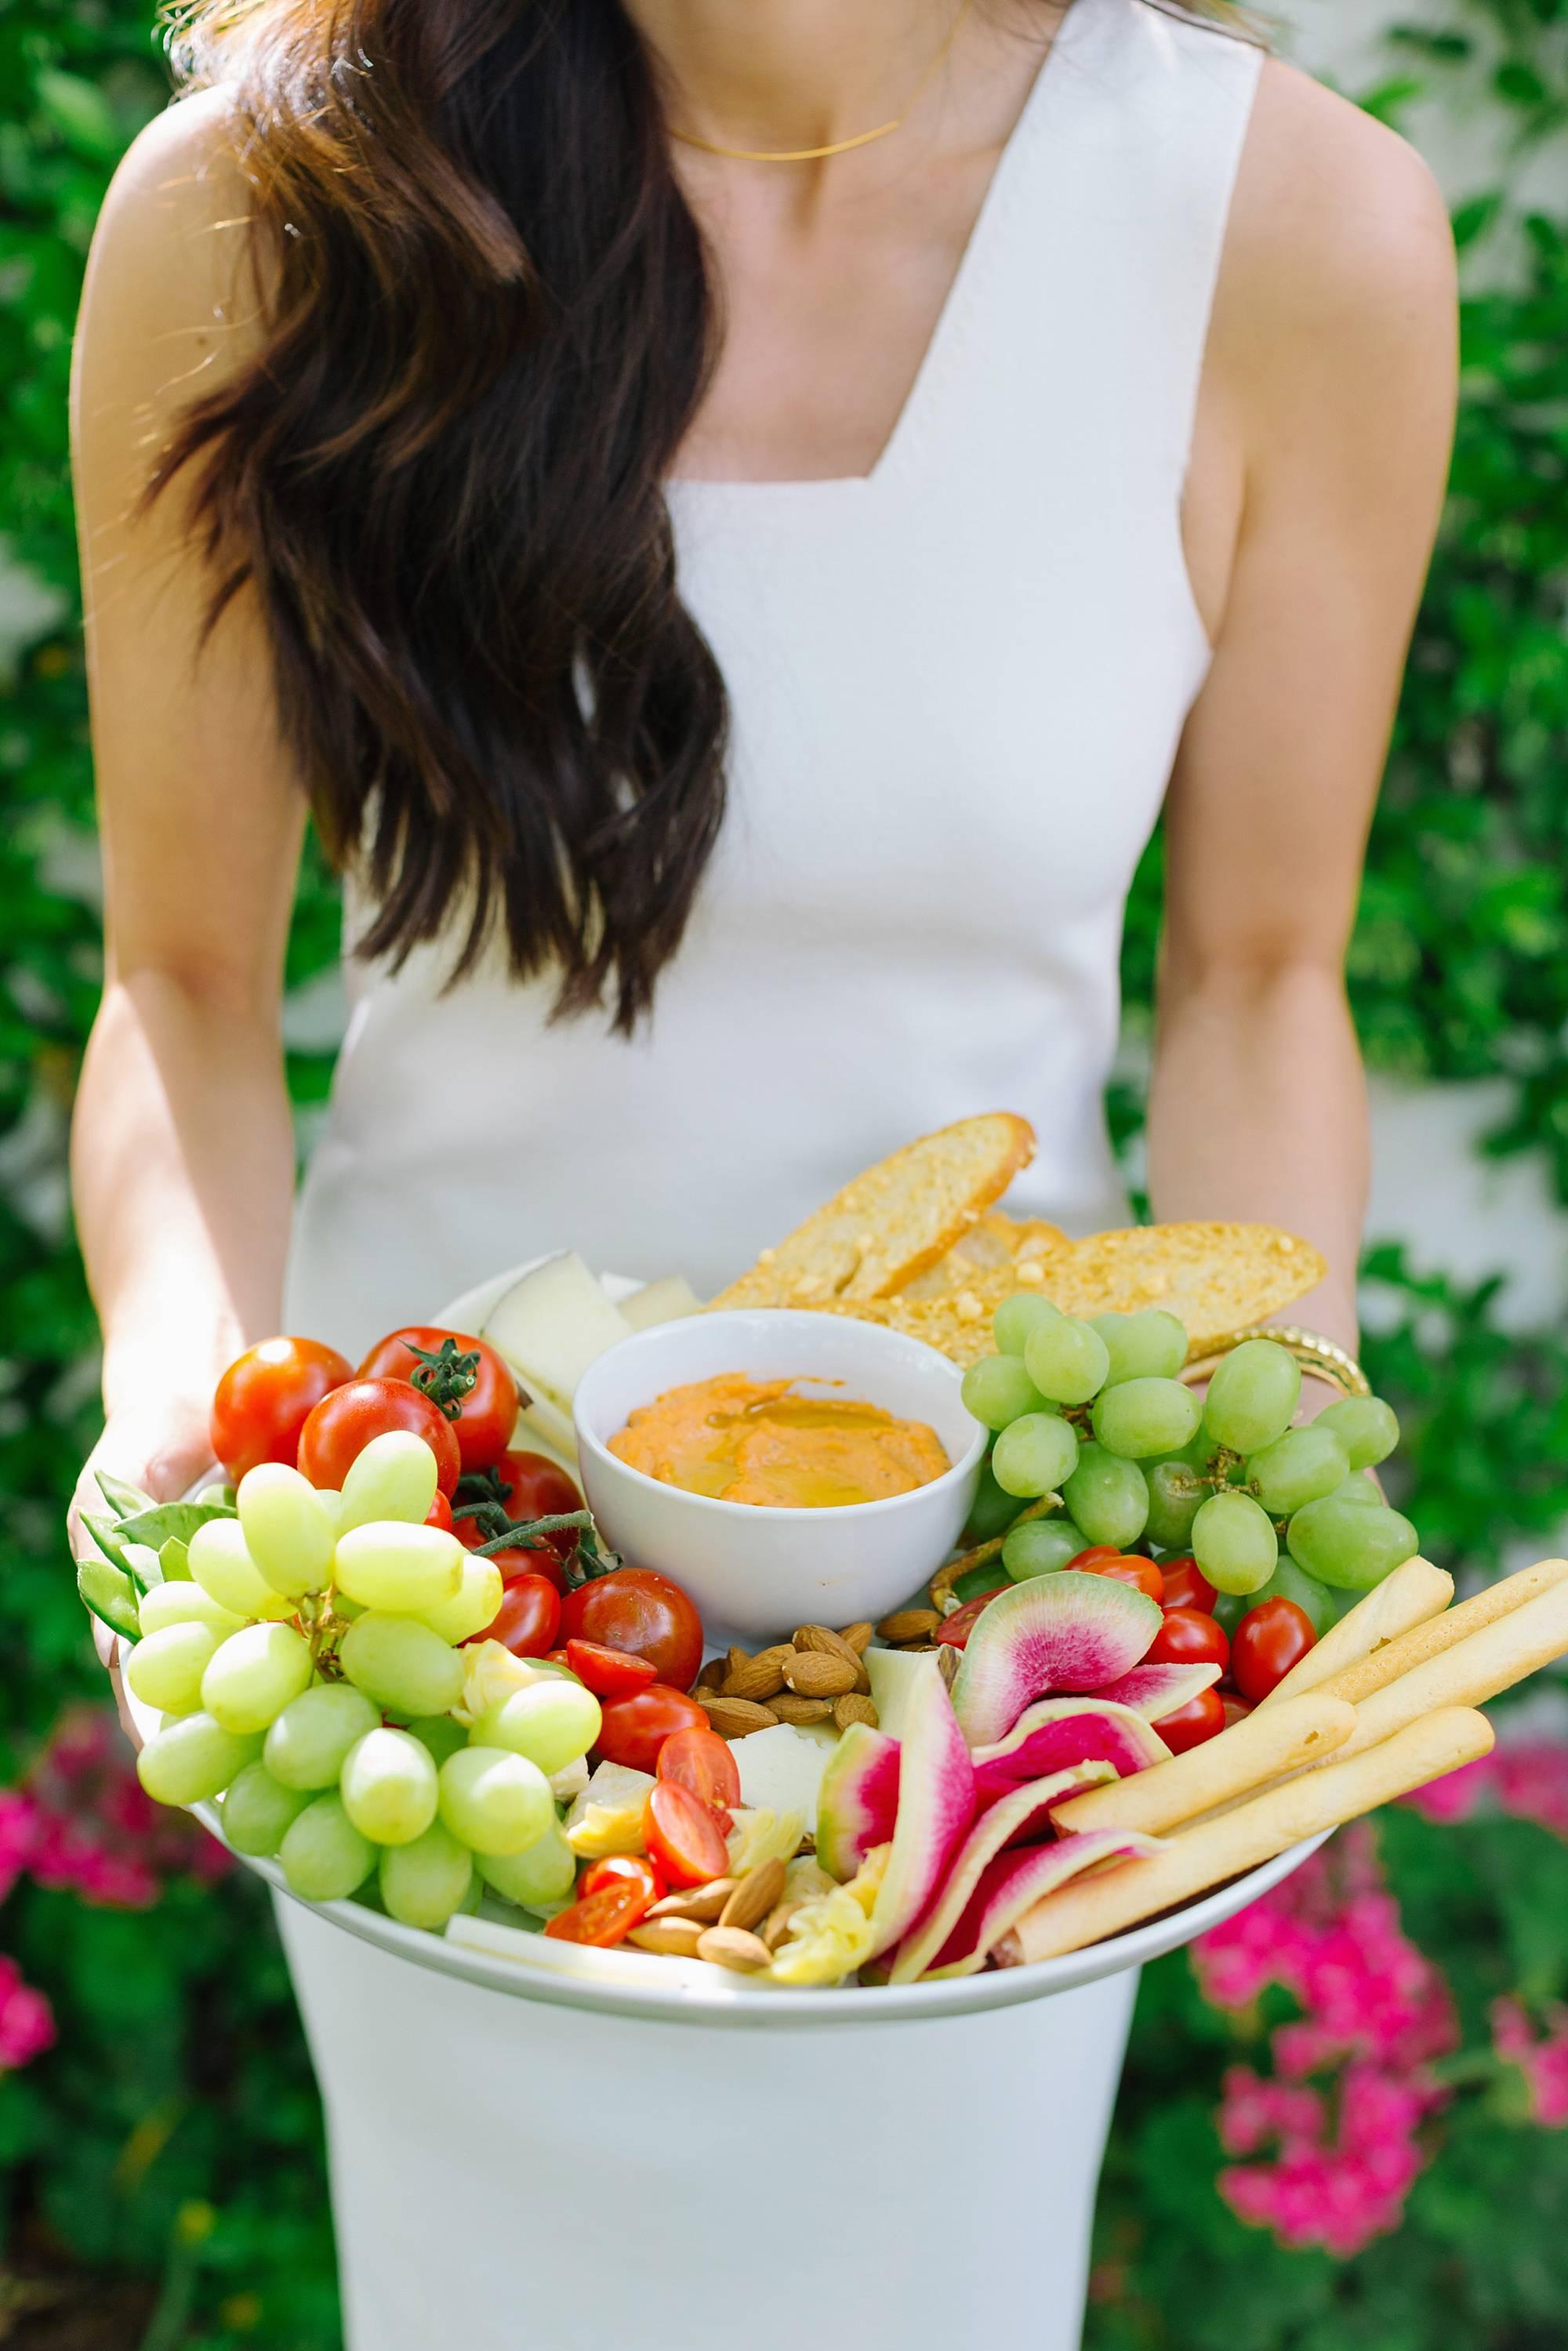 farmers market inspirational get together with decoy wine in the backyard - lifestyle blogger Diana Elizabeth in Phoenix Arizona